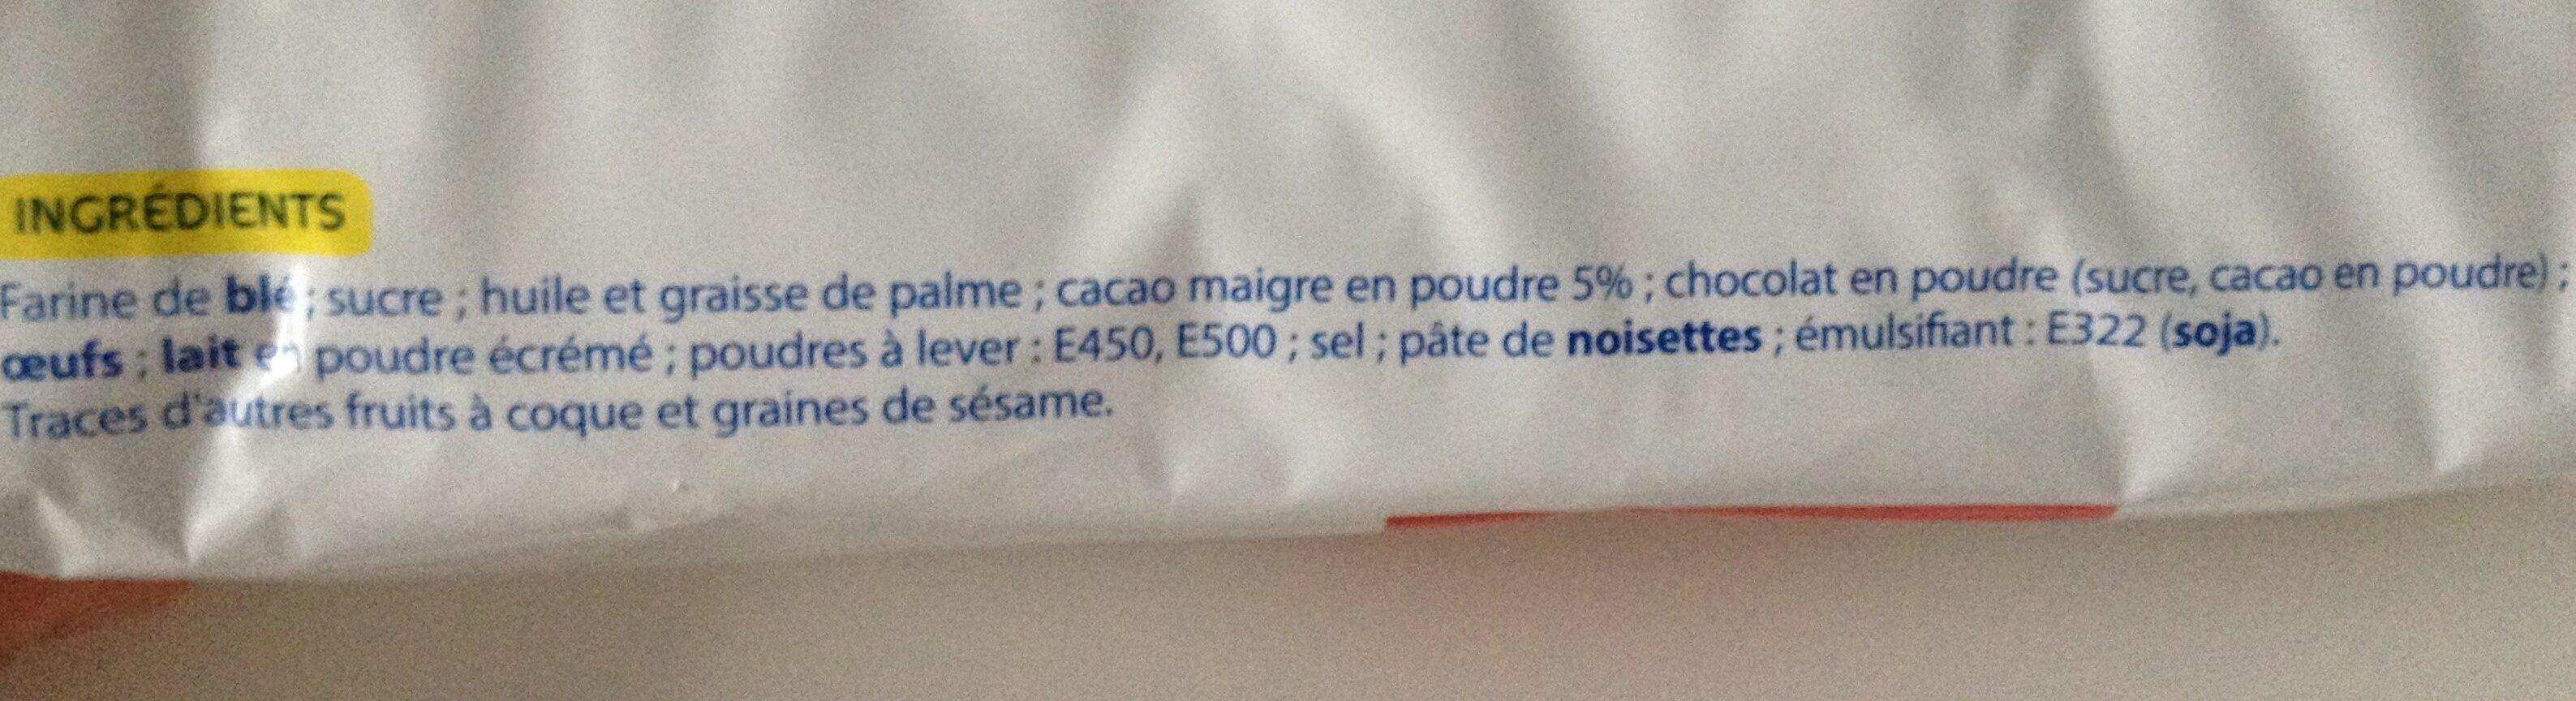 Biscuits Fourrés Cacao - المكونات - fr